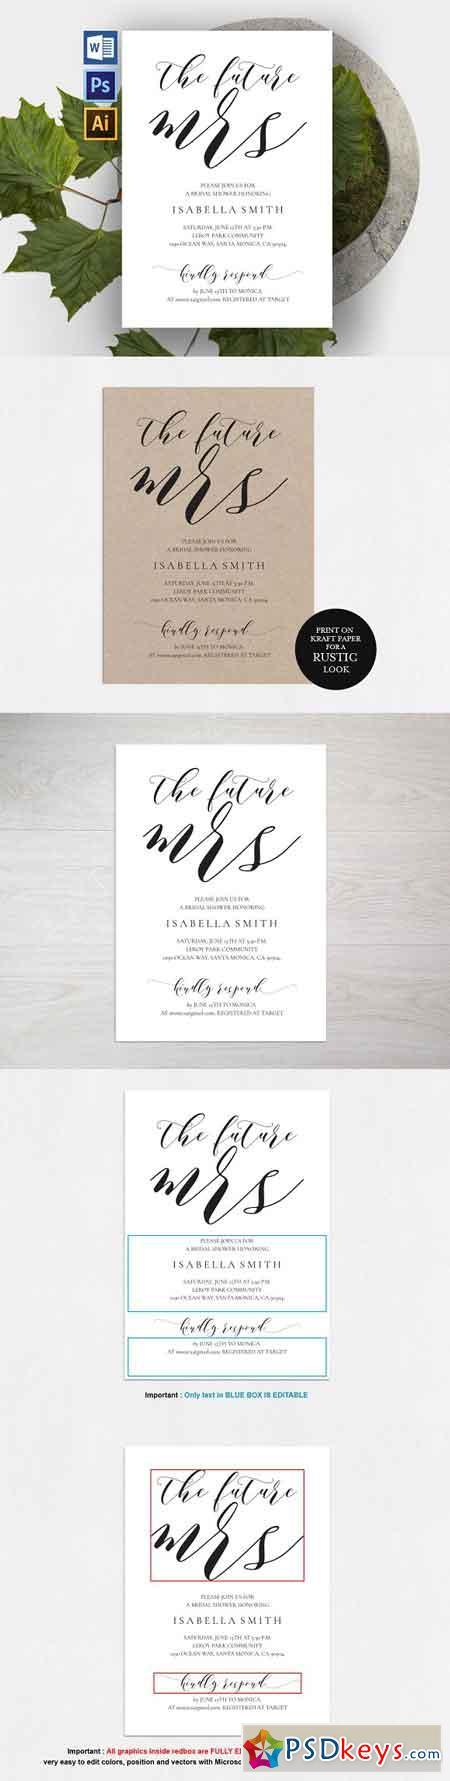 Bridal Shower Invitation Wpc308 1765226